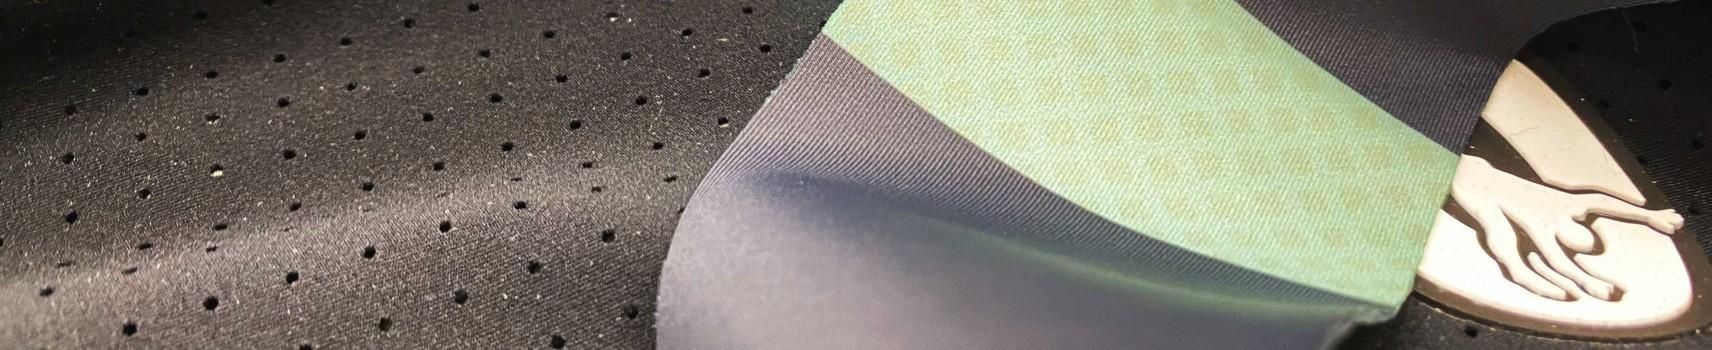 ROSTI men's cycling shorts and tights